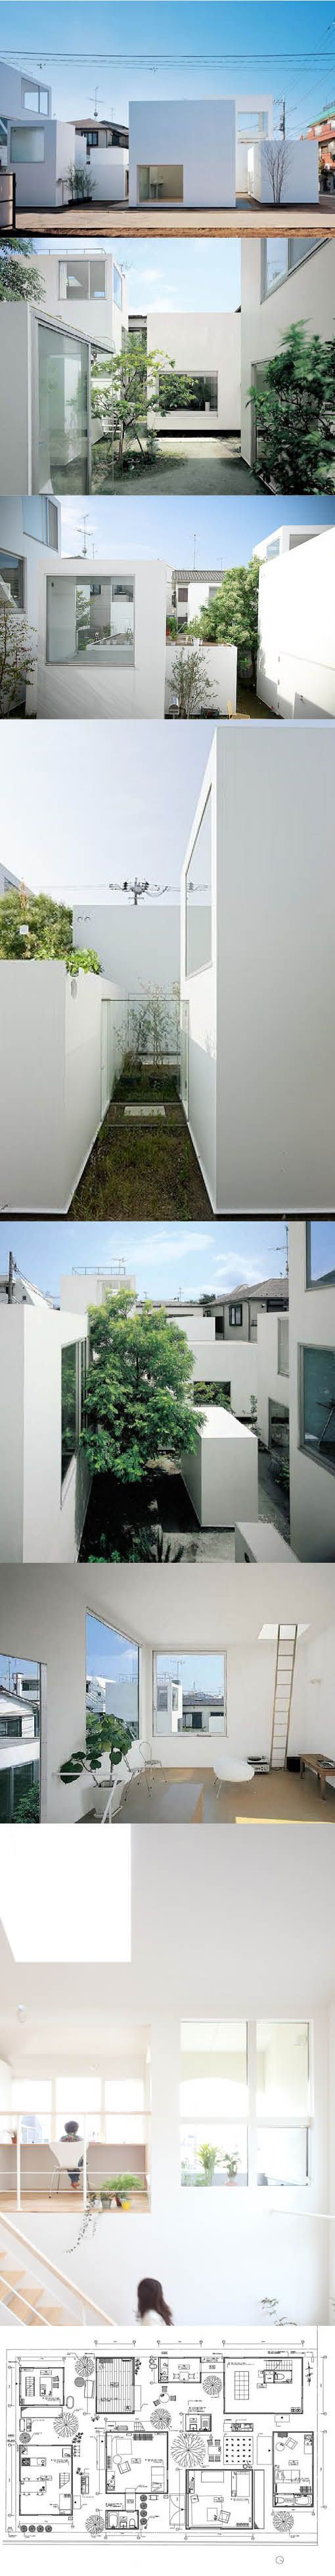 2002-2005 Sanaa - Moriyama House / Tokyo Japan / white / minimalism